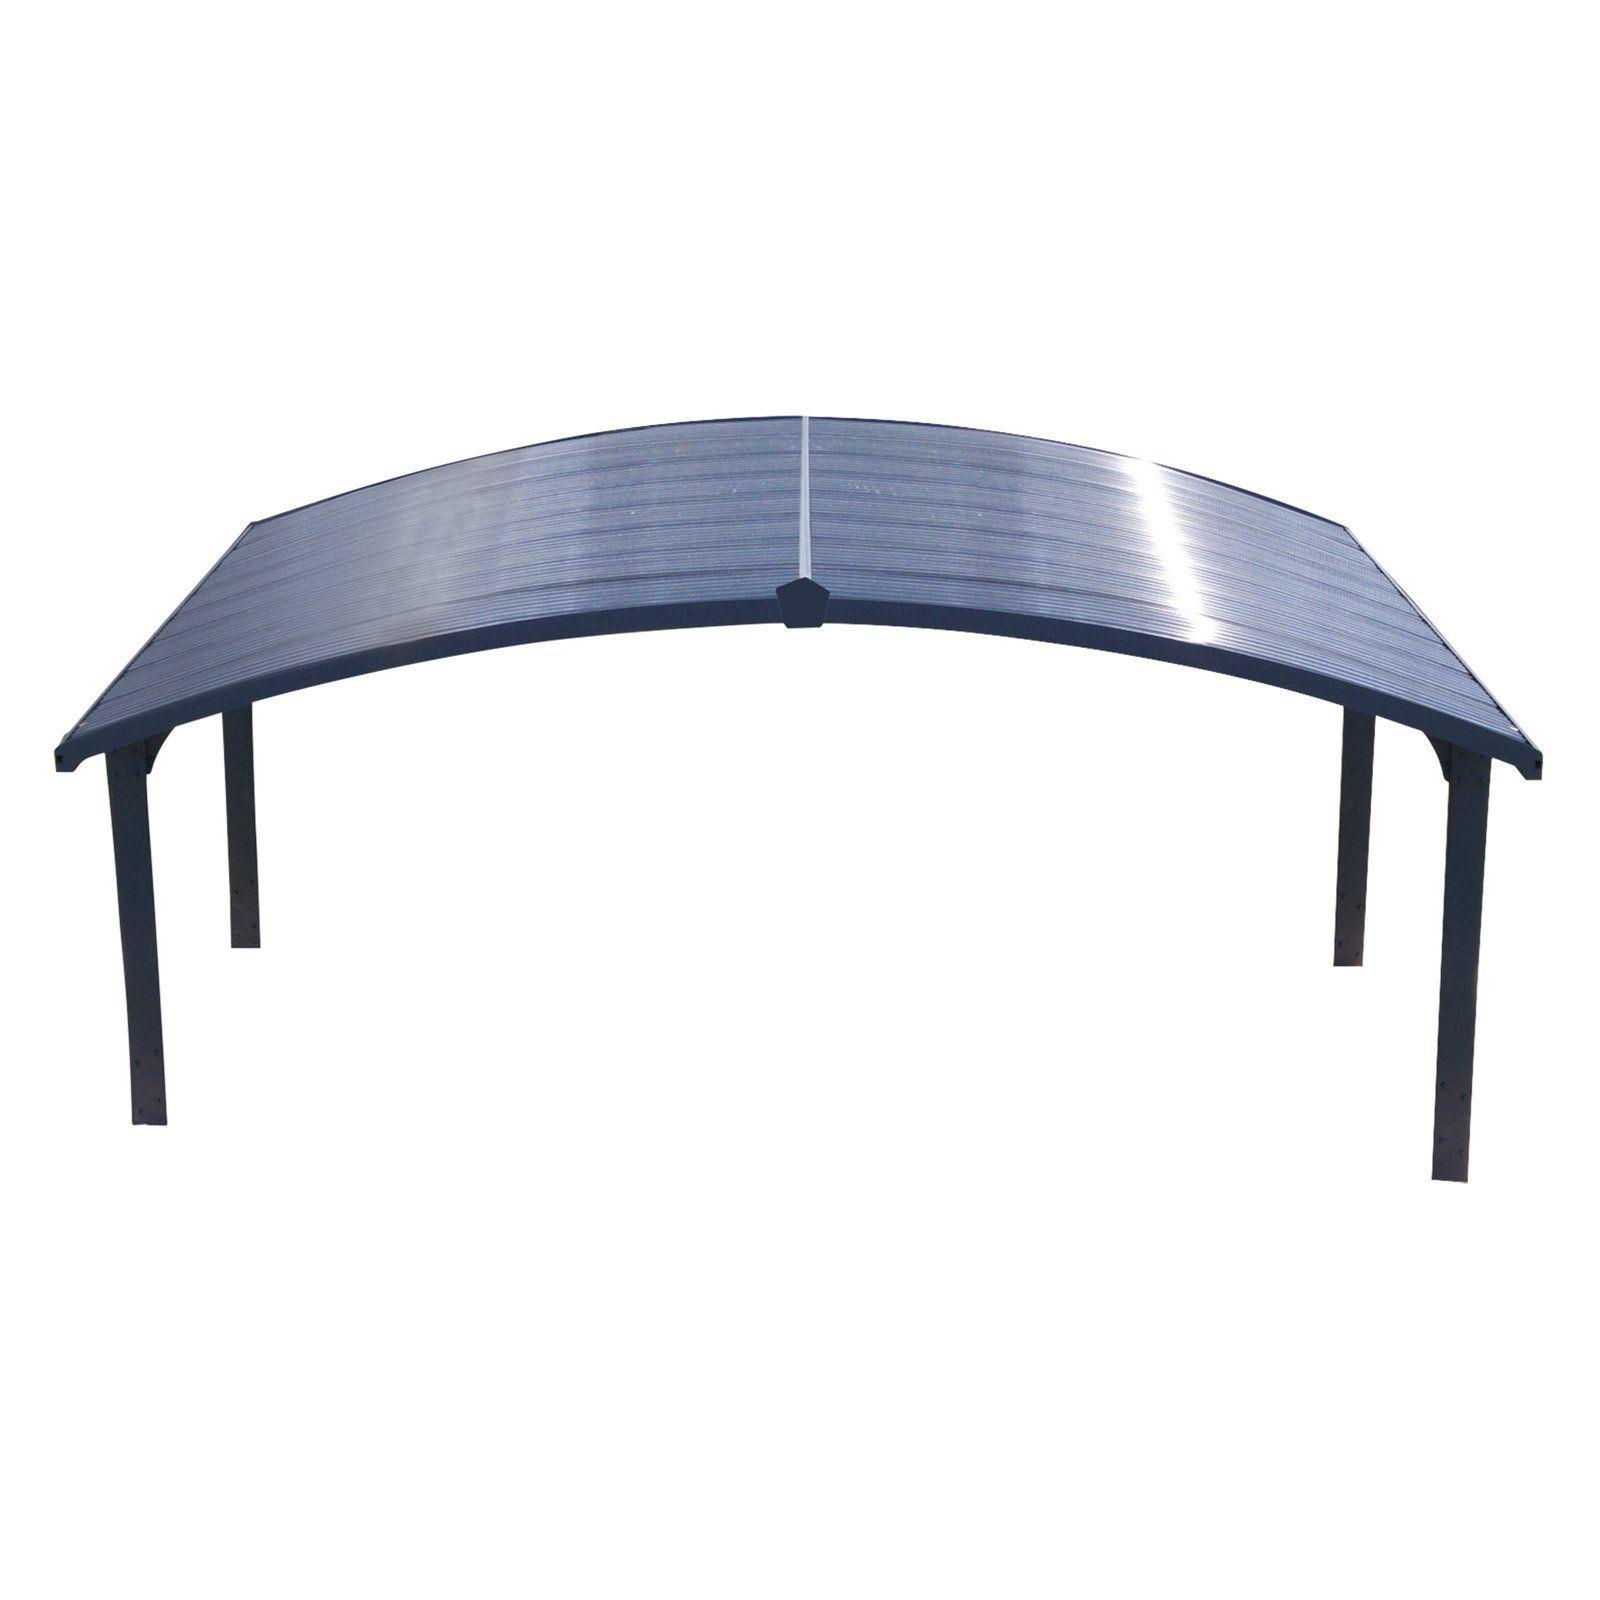 Palram Arizona Wave 19 X 16 Ft Arch Style Double Carport In 2020 Double Carport Carport Concrete Footings